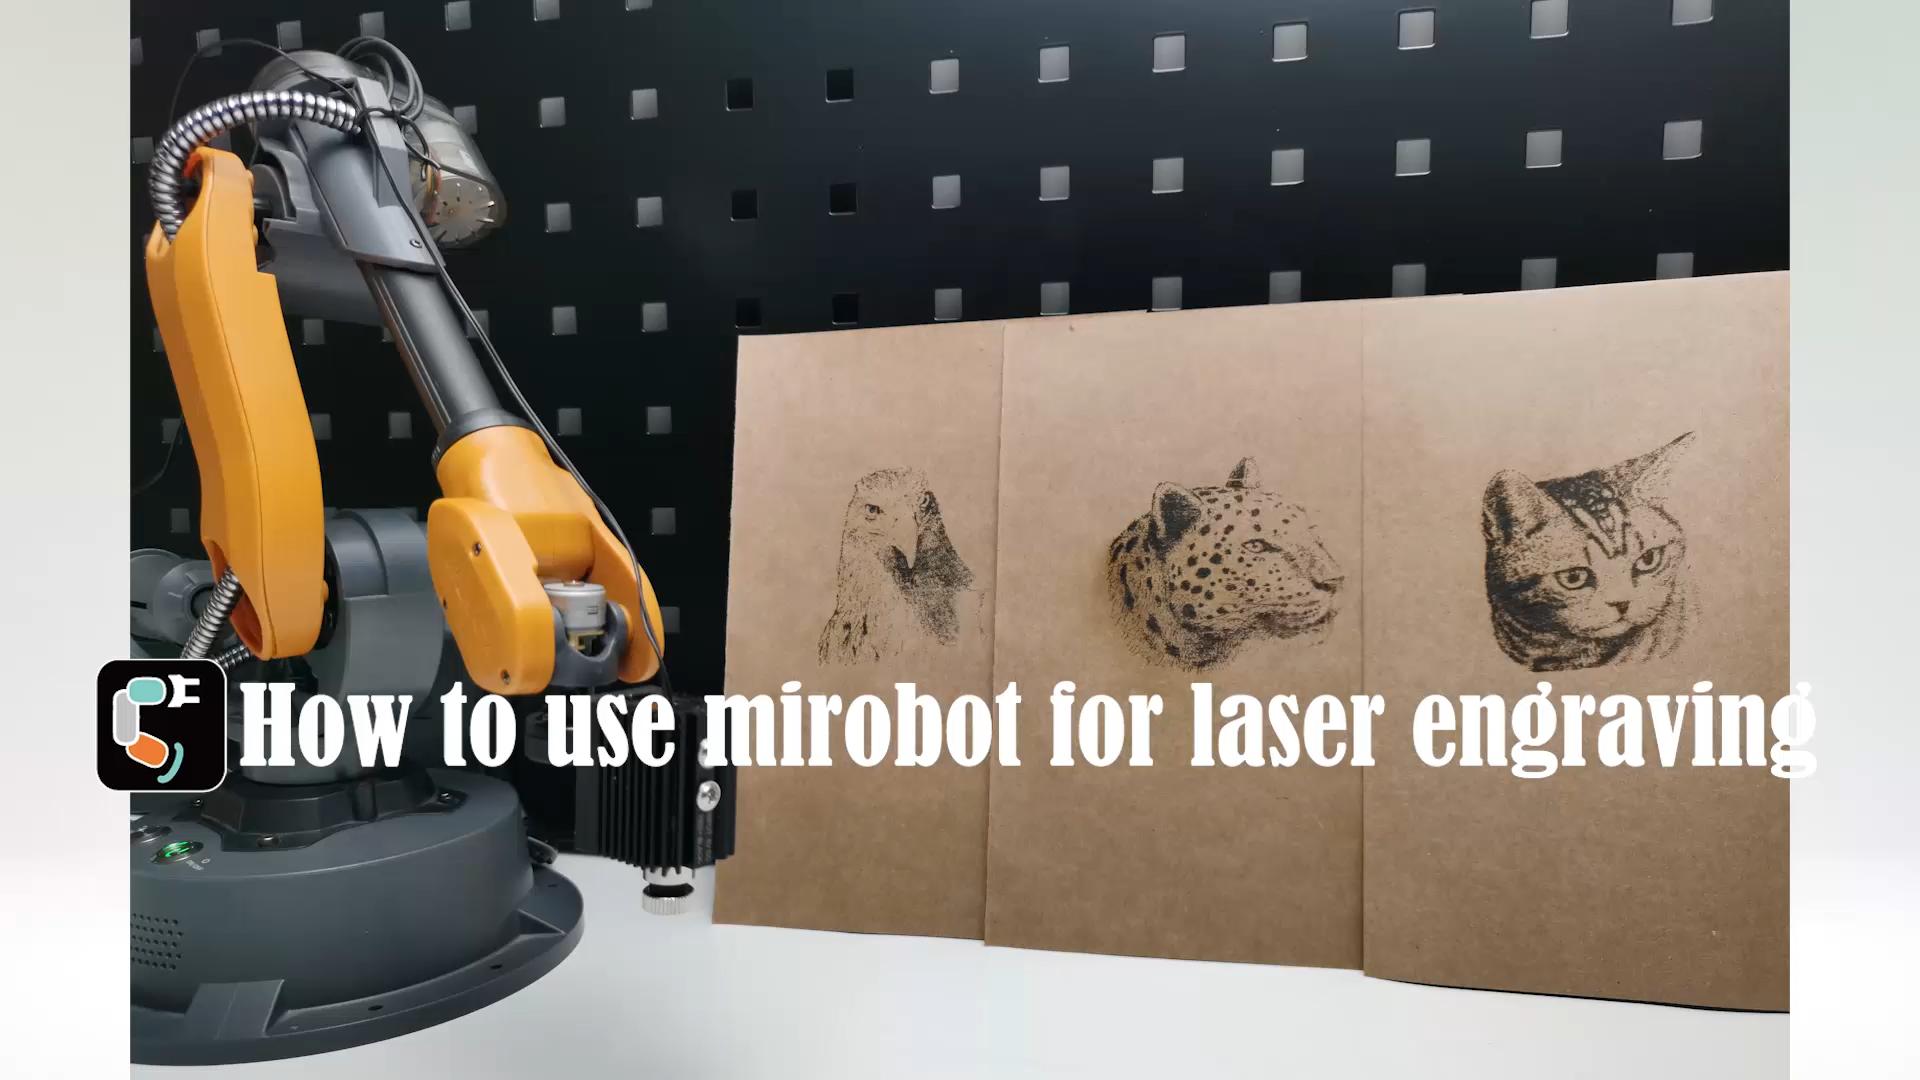 【05】Mirobot激光雕刻使用教程